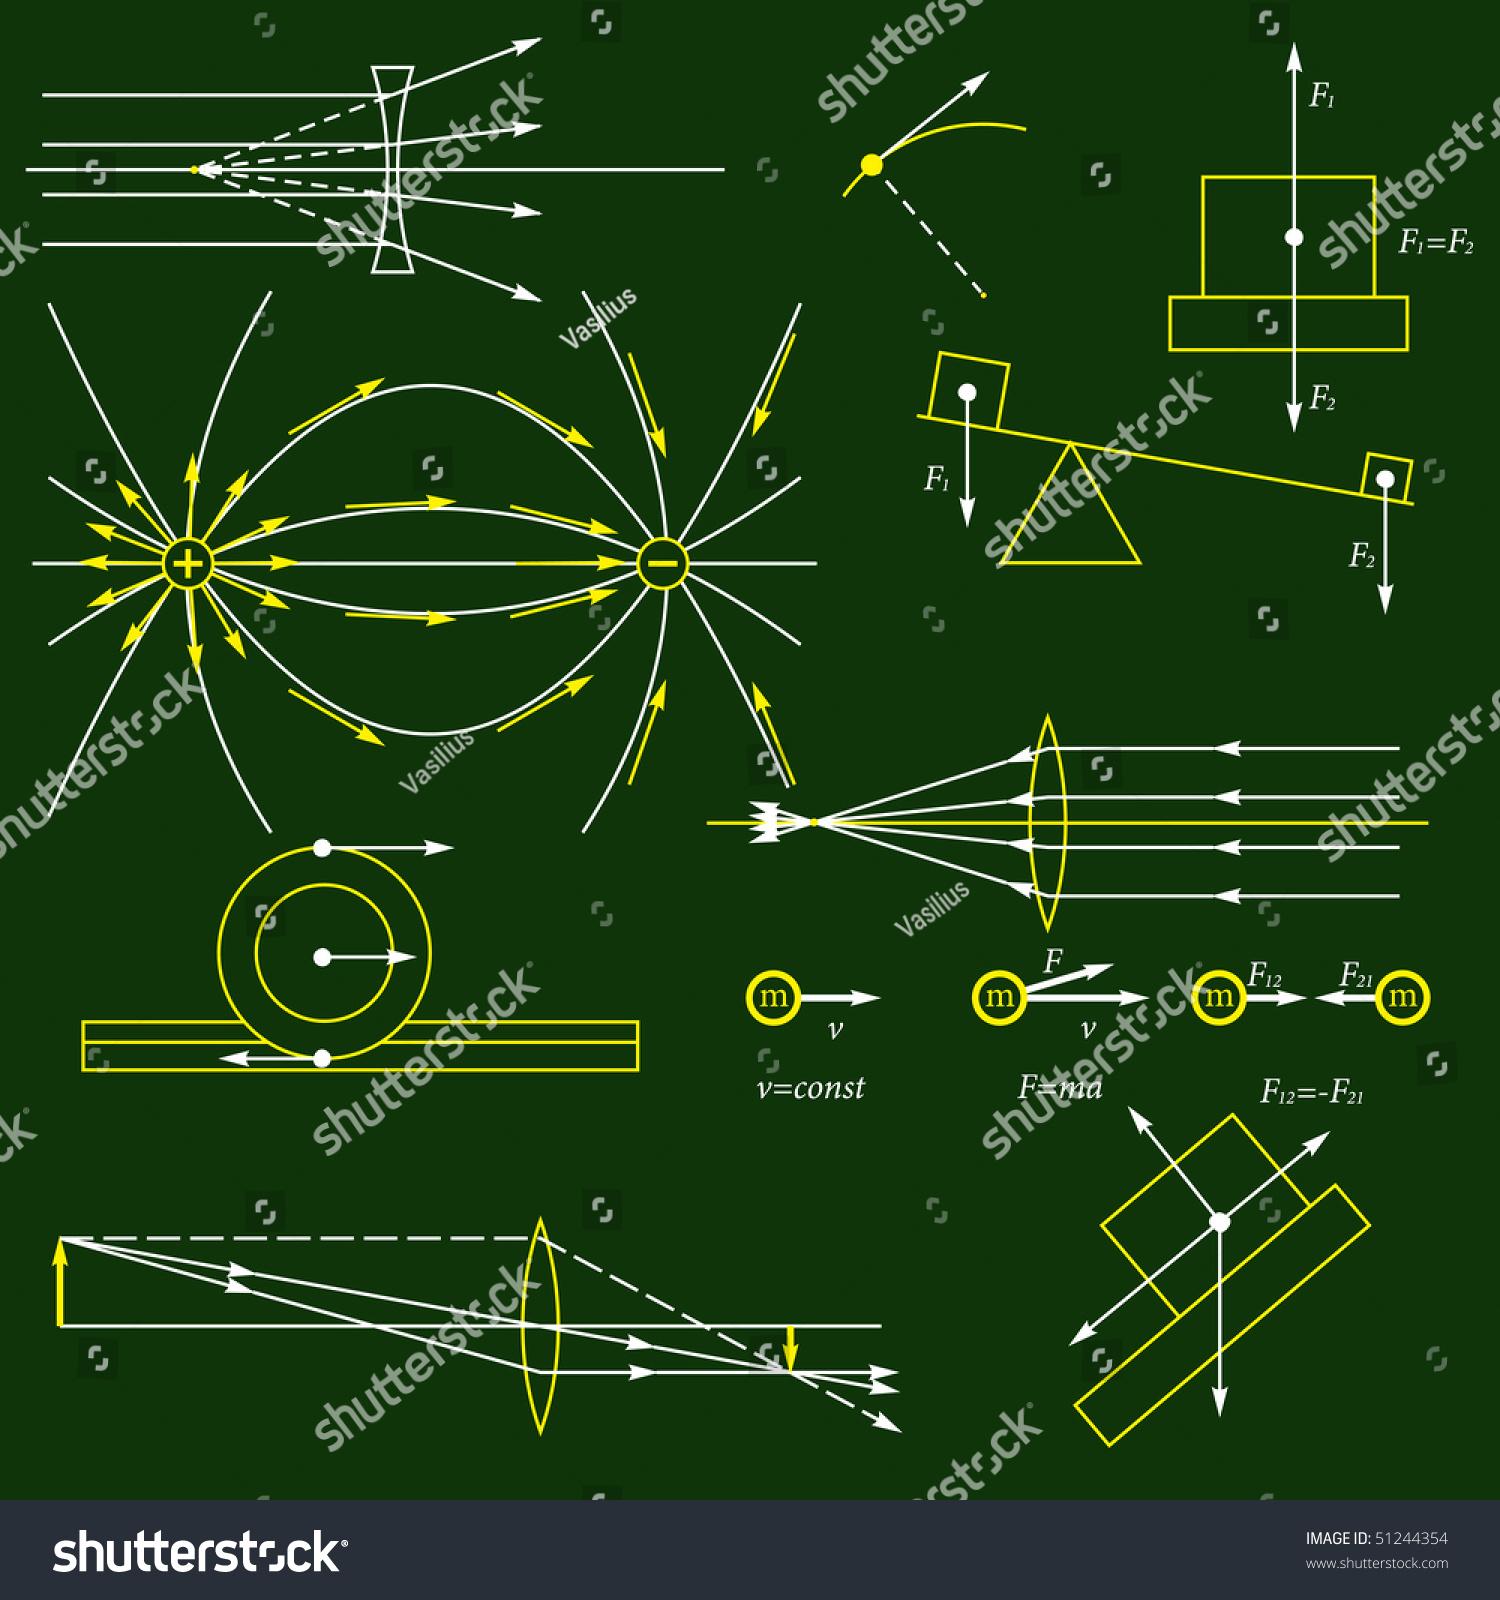 physics background stock photos - photo #11